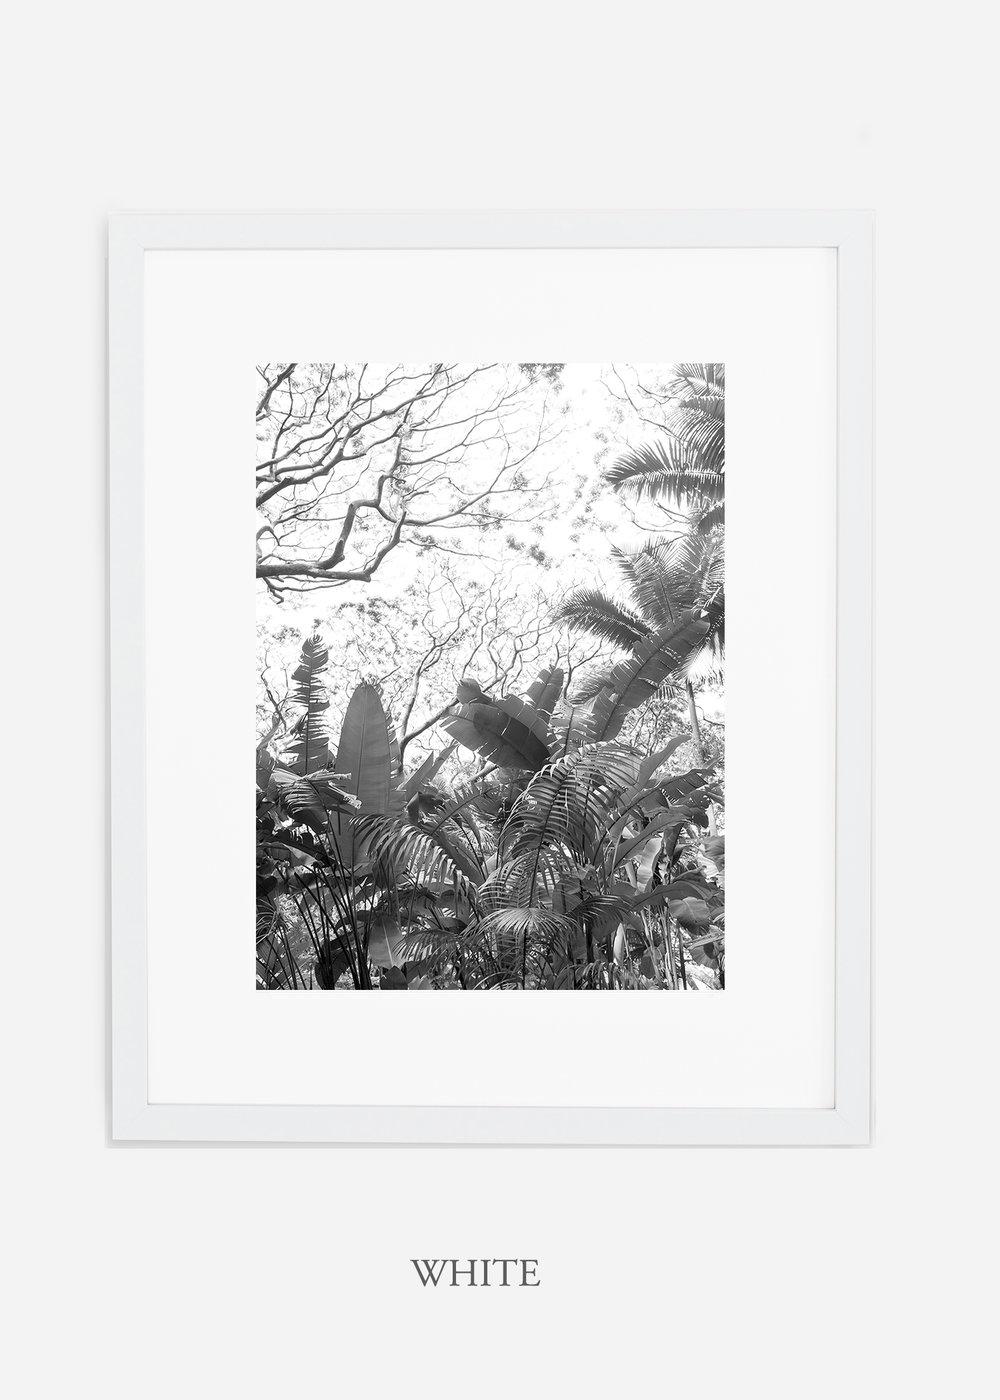 tropicaldecor_WilderCalifornia_TropicalRainforest2_Art_Photography_interiordesign_whiteframe.jpg